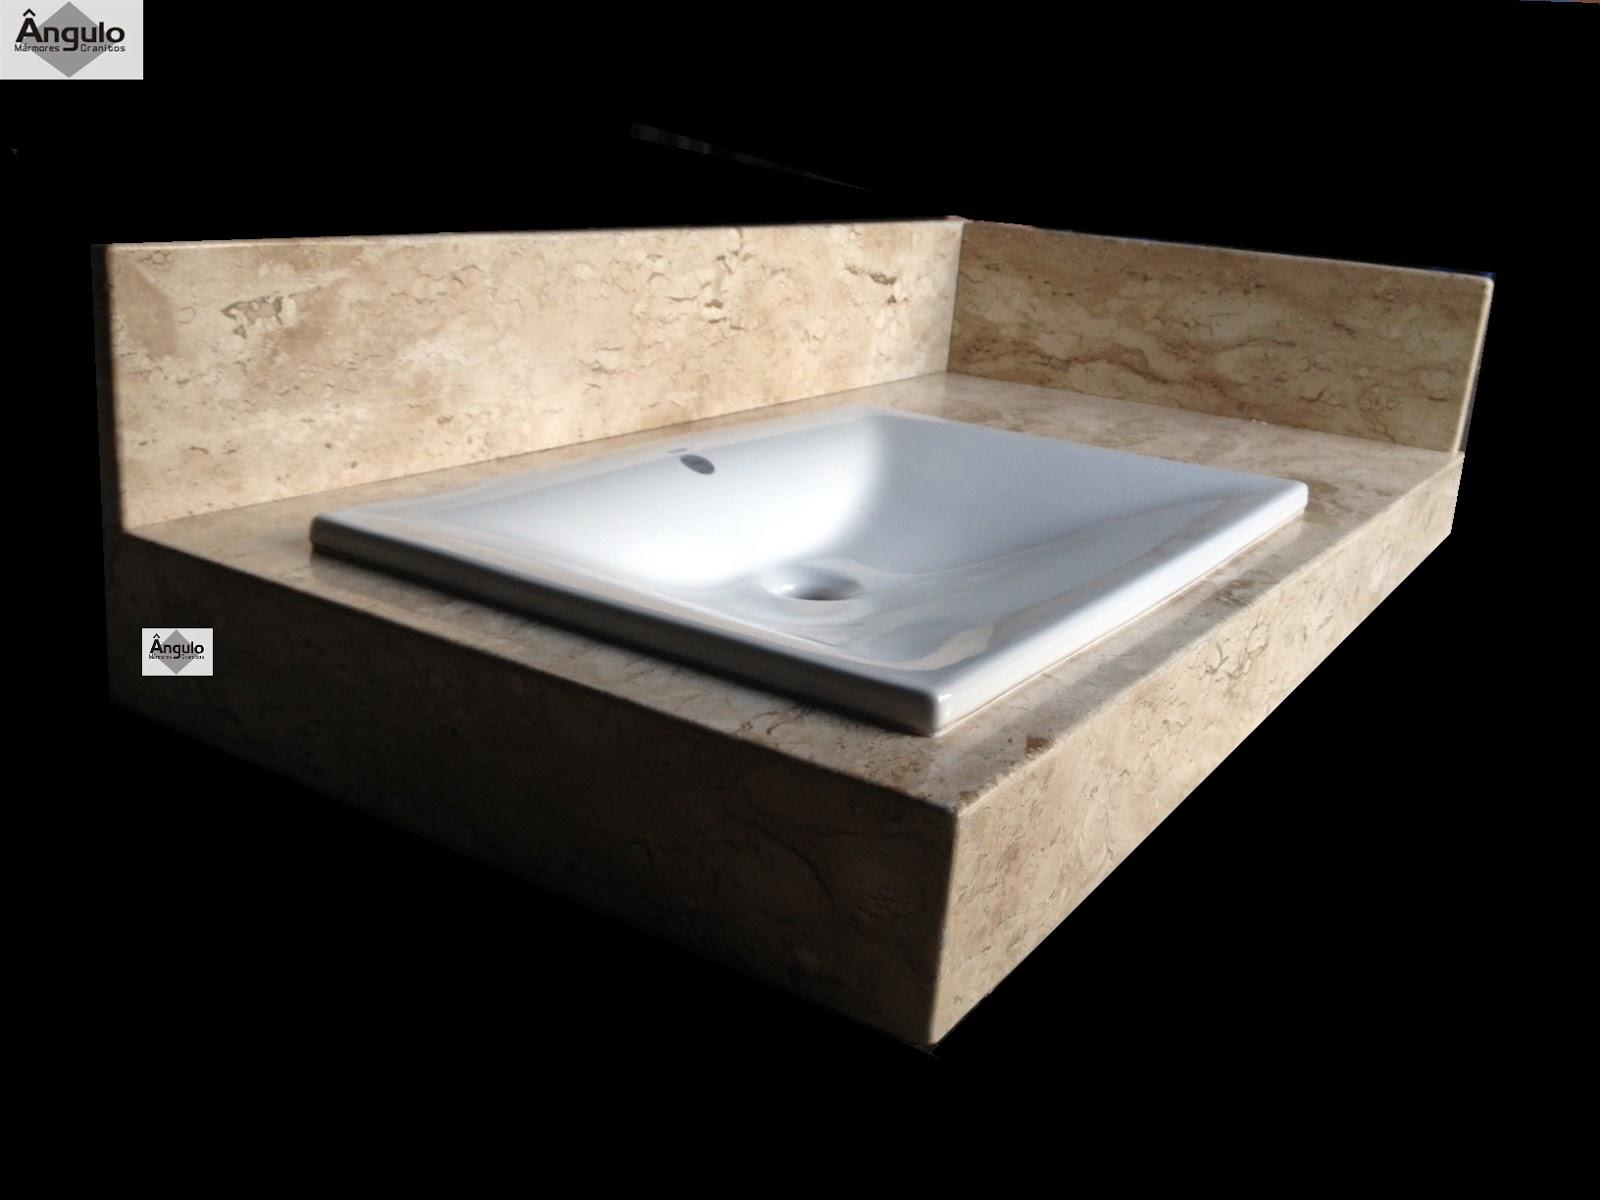 Ângulo Mármores e Granitos: Bancada Para Banheiro Bege Bahia #856946 1600x1200 Banheiro Bancada Bege Bahia